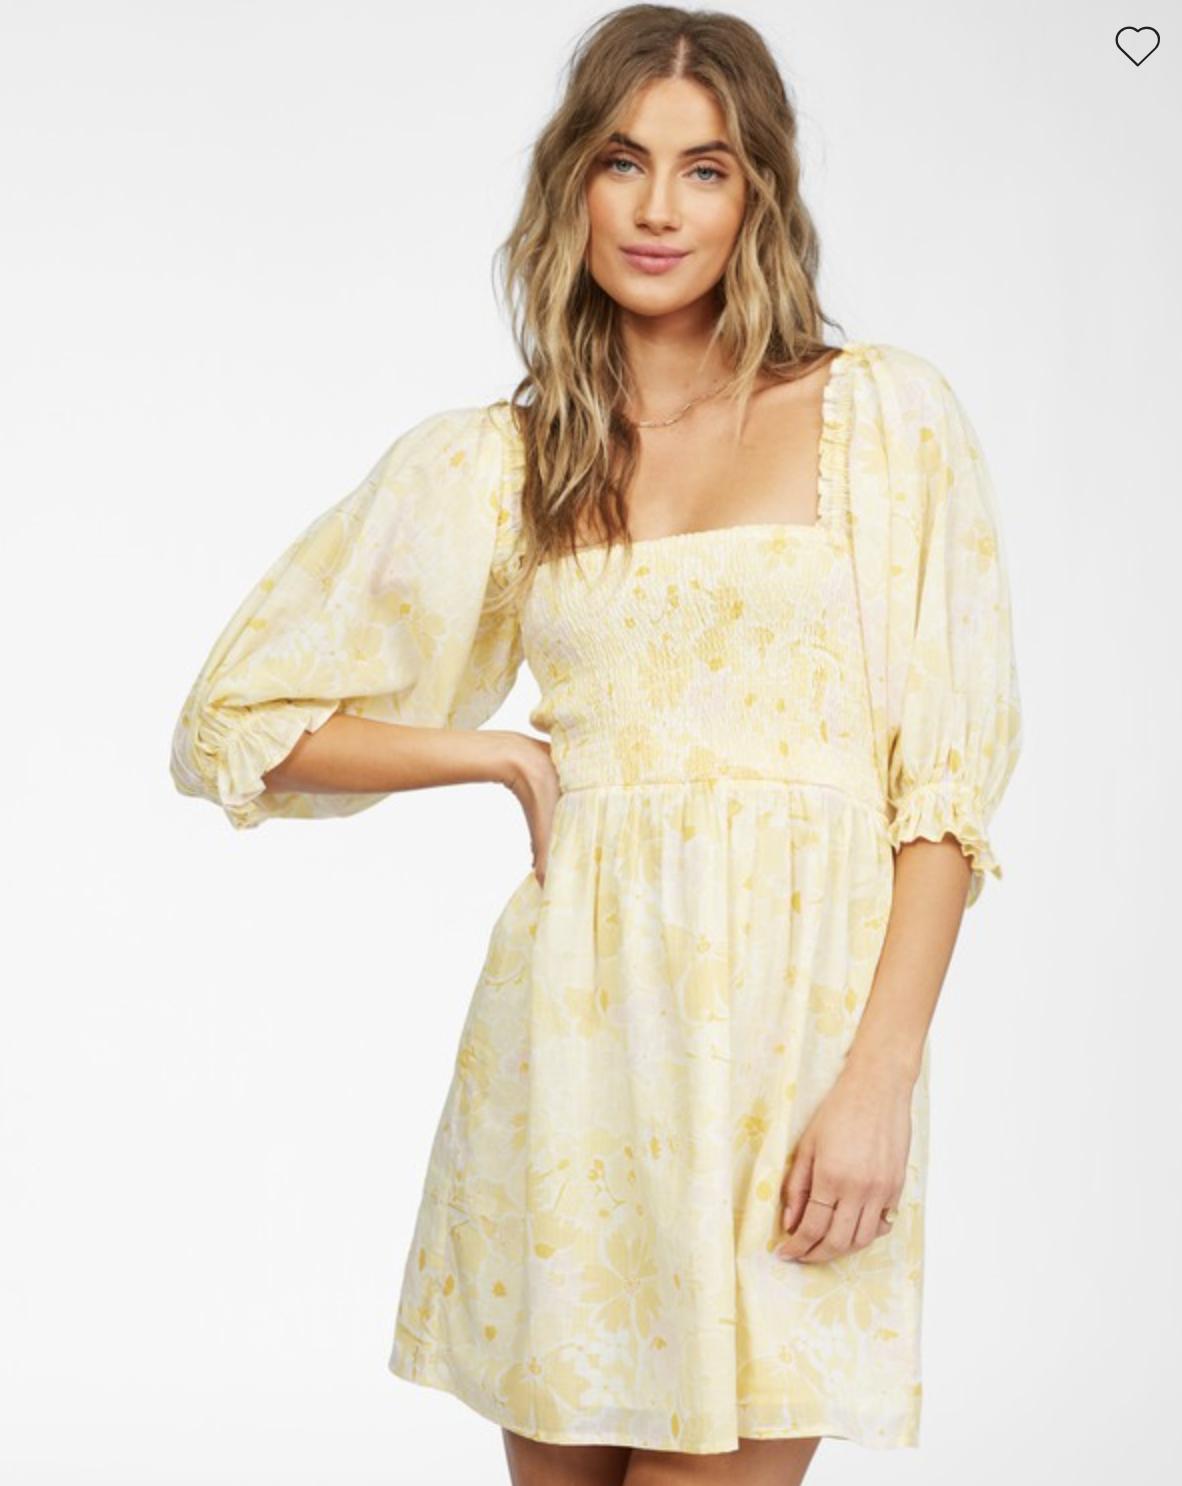 Groovy Girl Dress